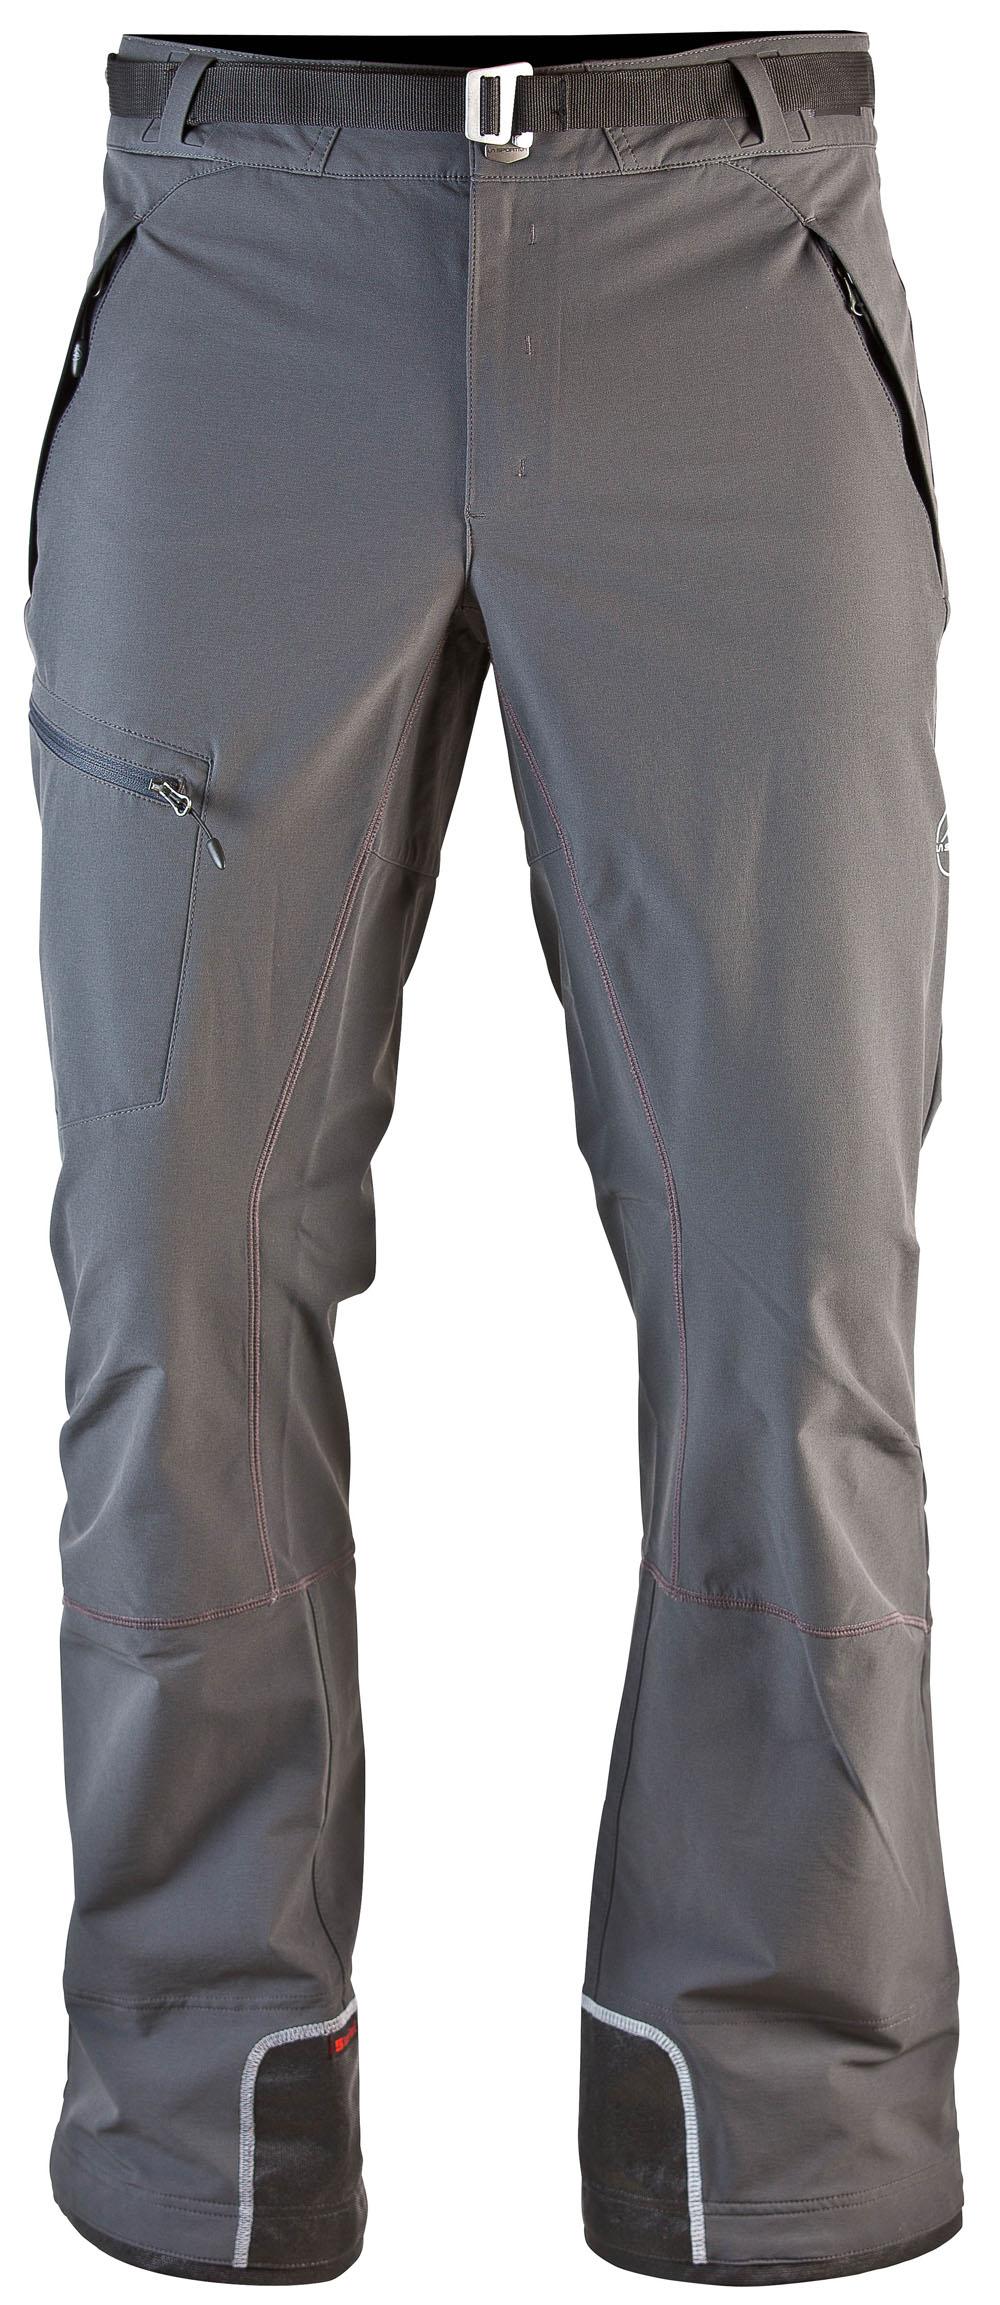 Брюки Trango Pant M Grey, B50GR, Брюки Softshell - арт. 315060346